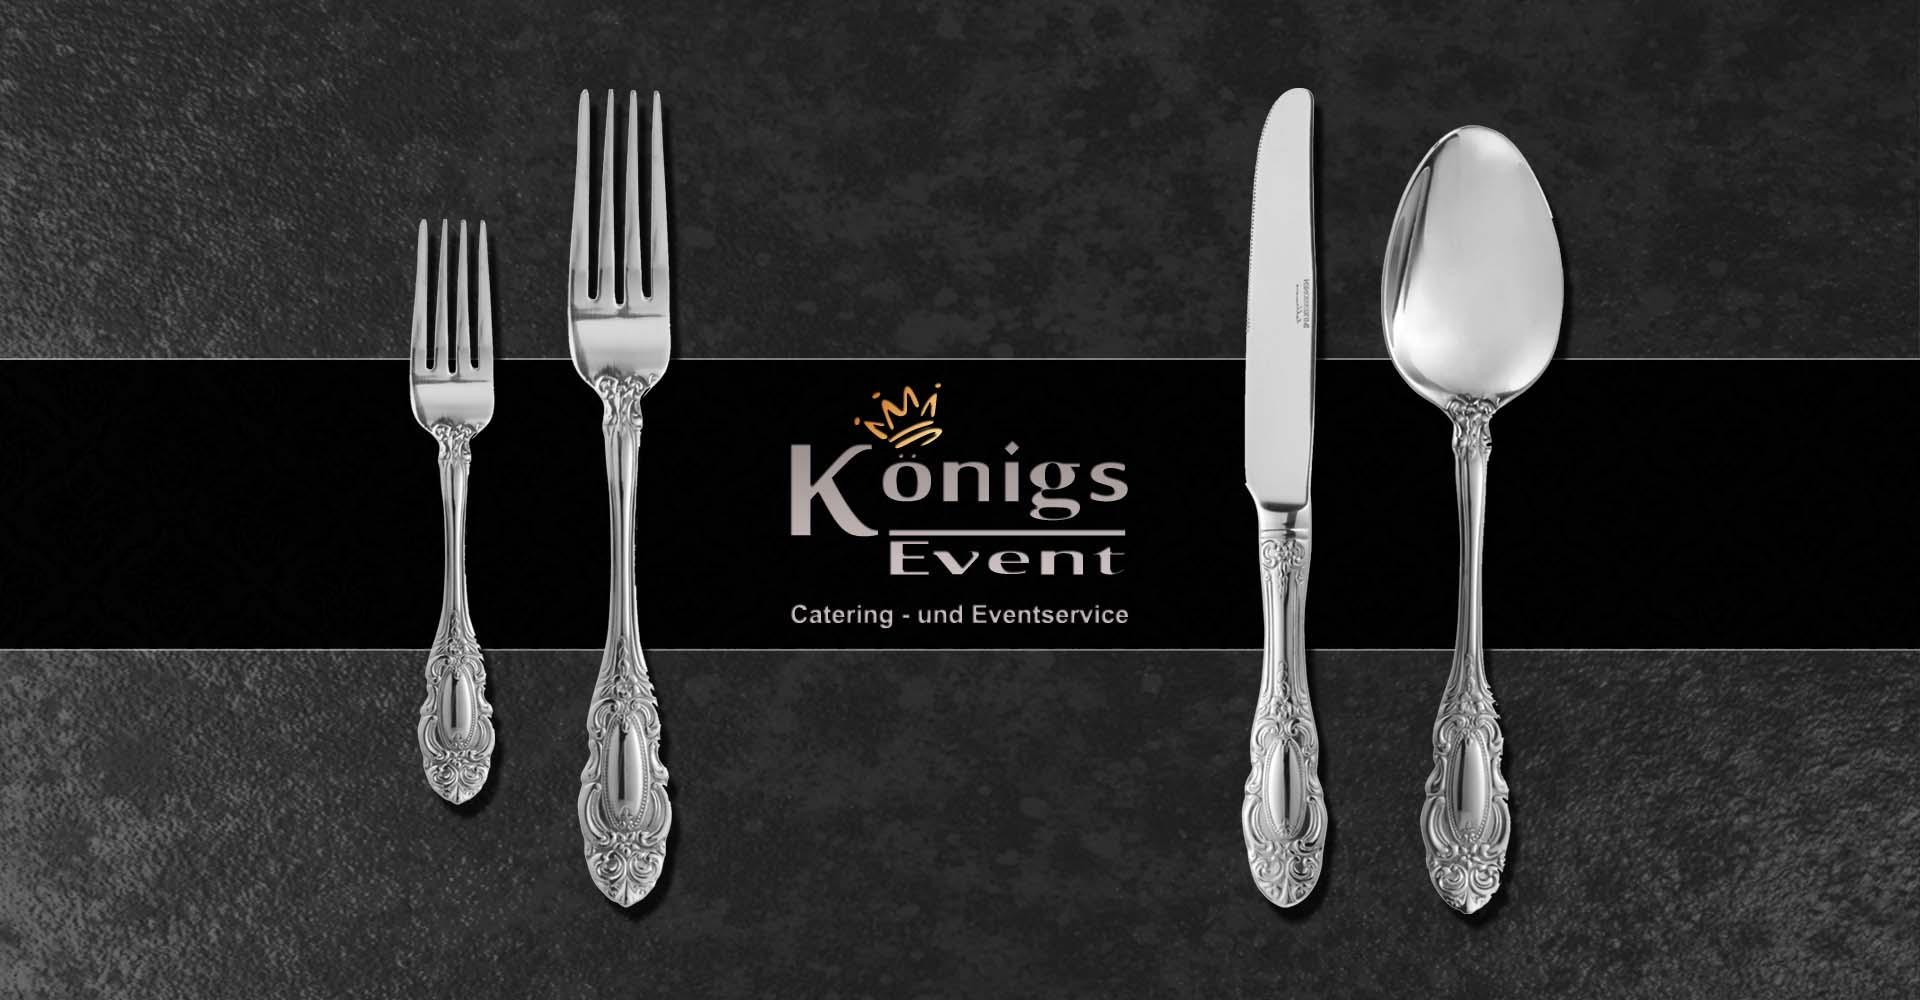 2015-05-26-Startbild-Koenigs-event-102